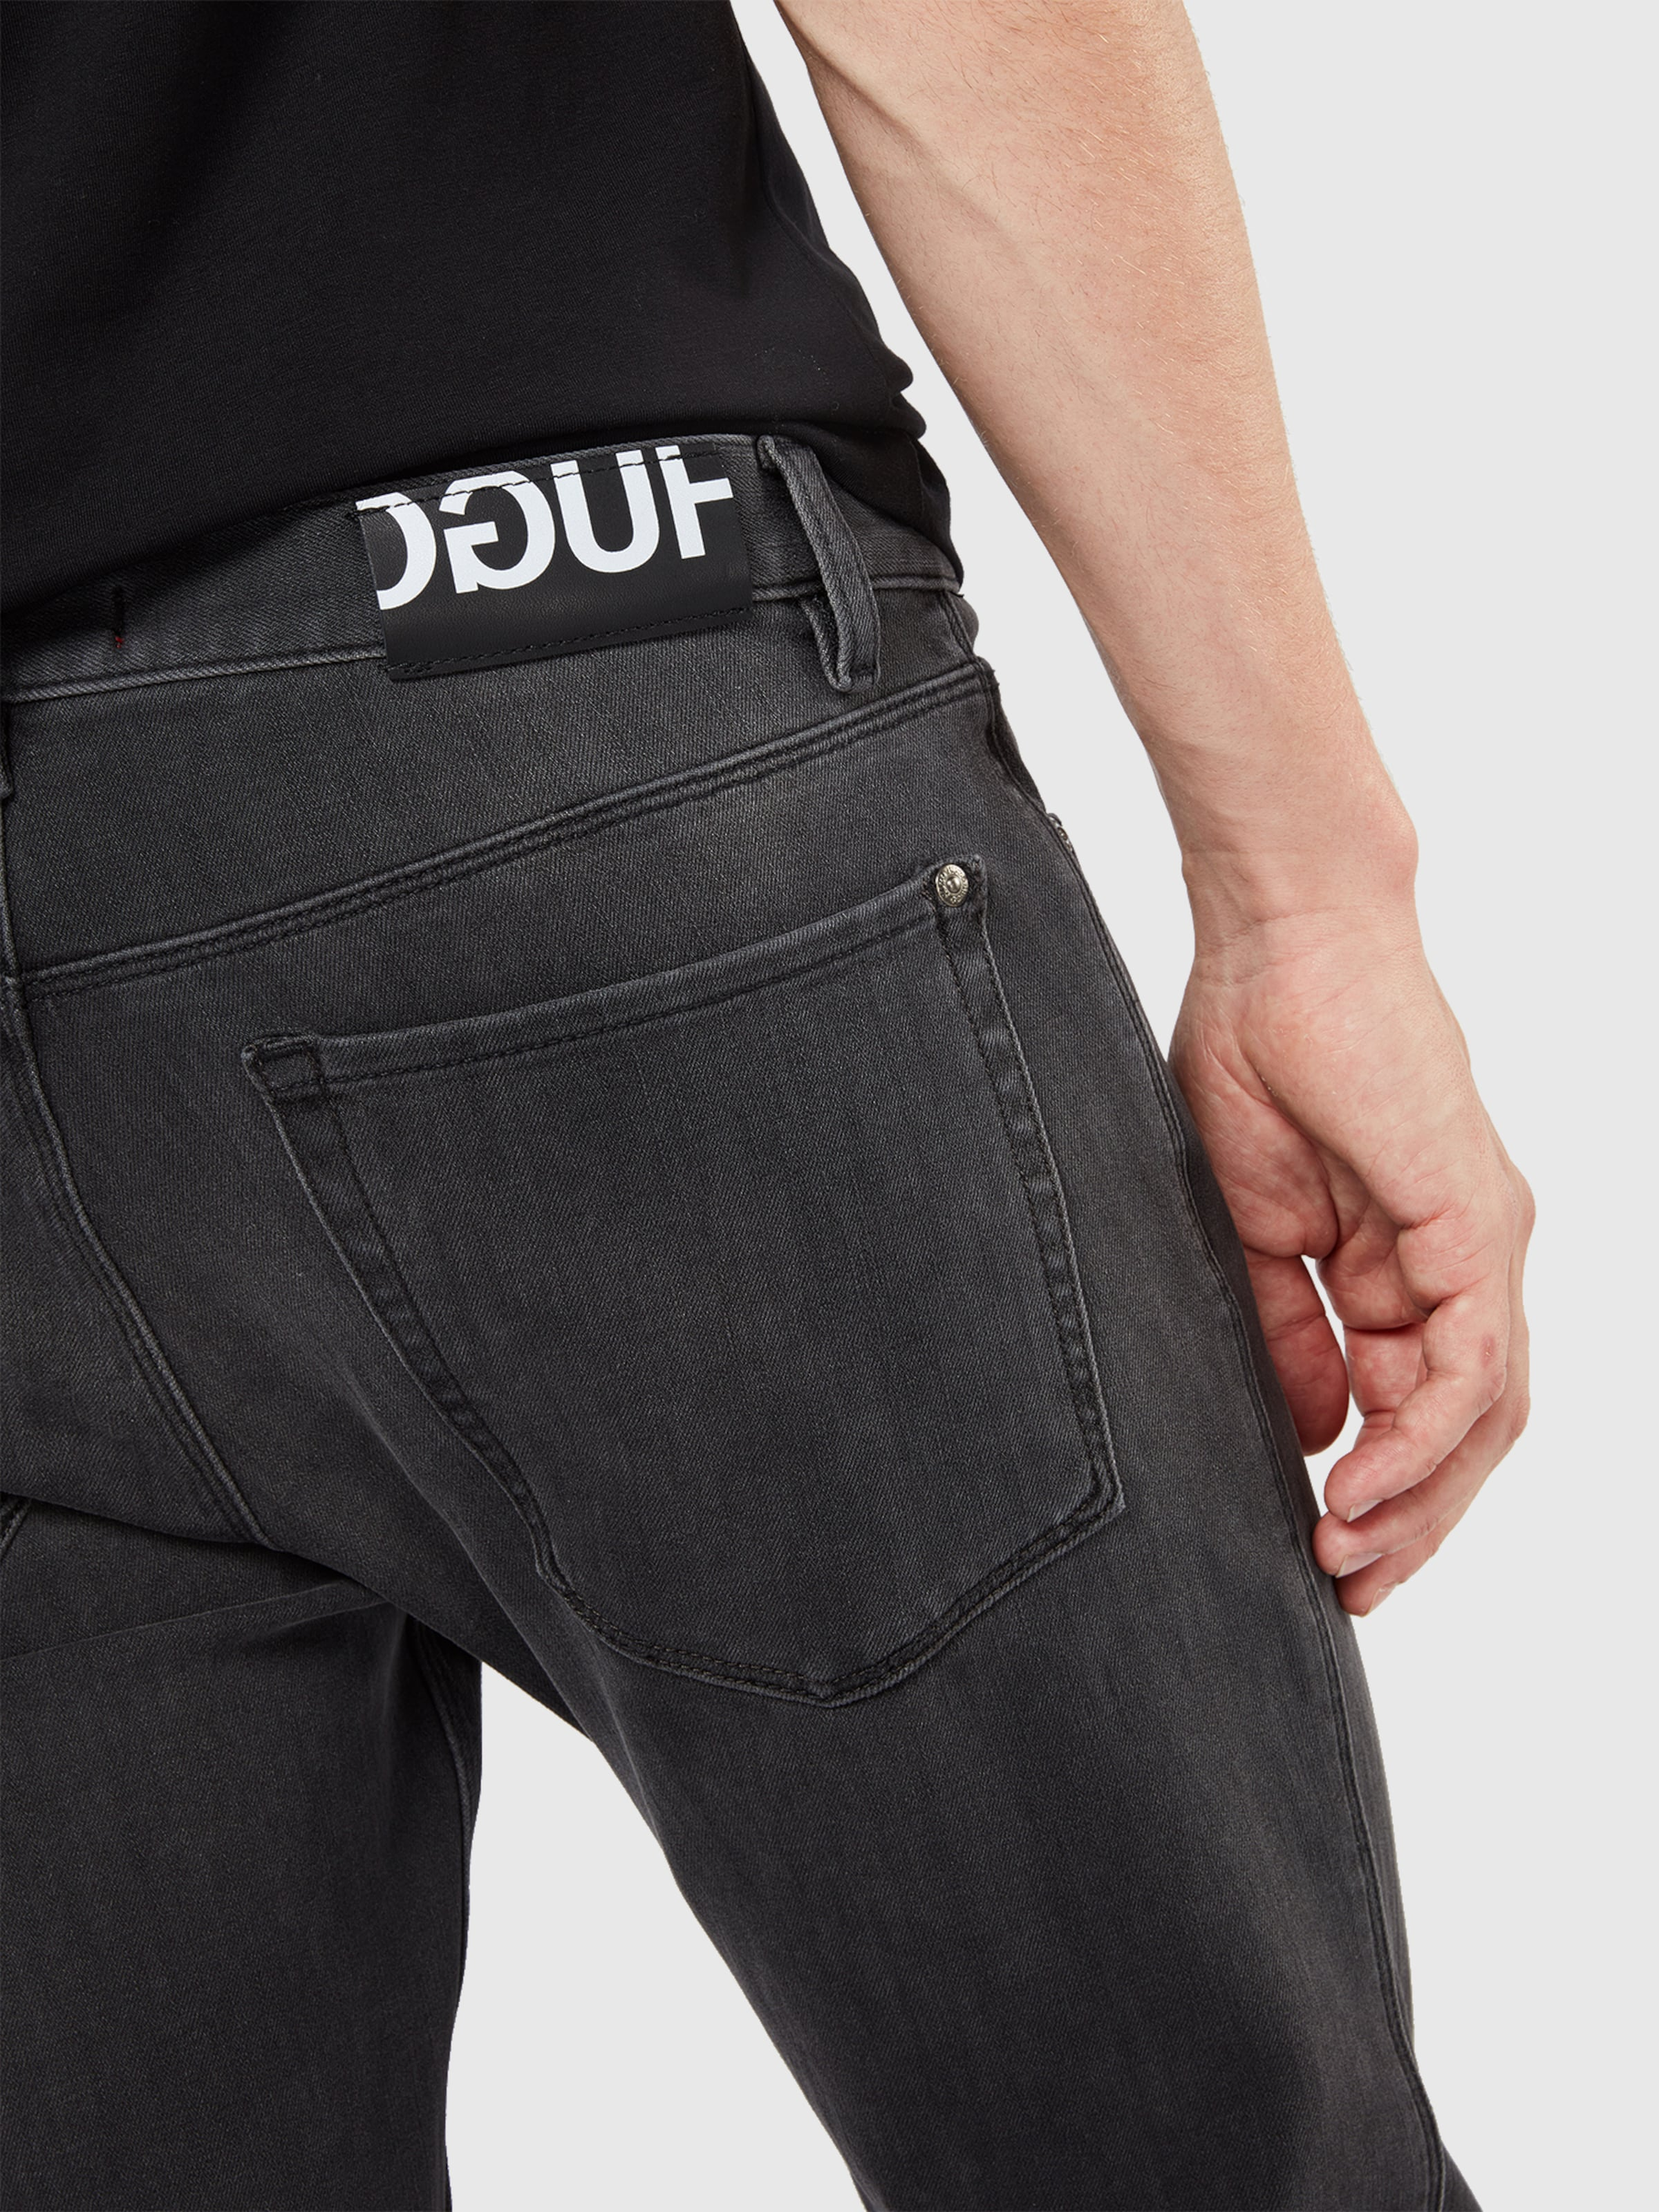 Wahl Günstig Online HUGO Slim-Fit-Jeans 'Hugo 708' Verkauf Neueste BCy5MjNWz